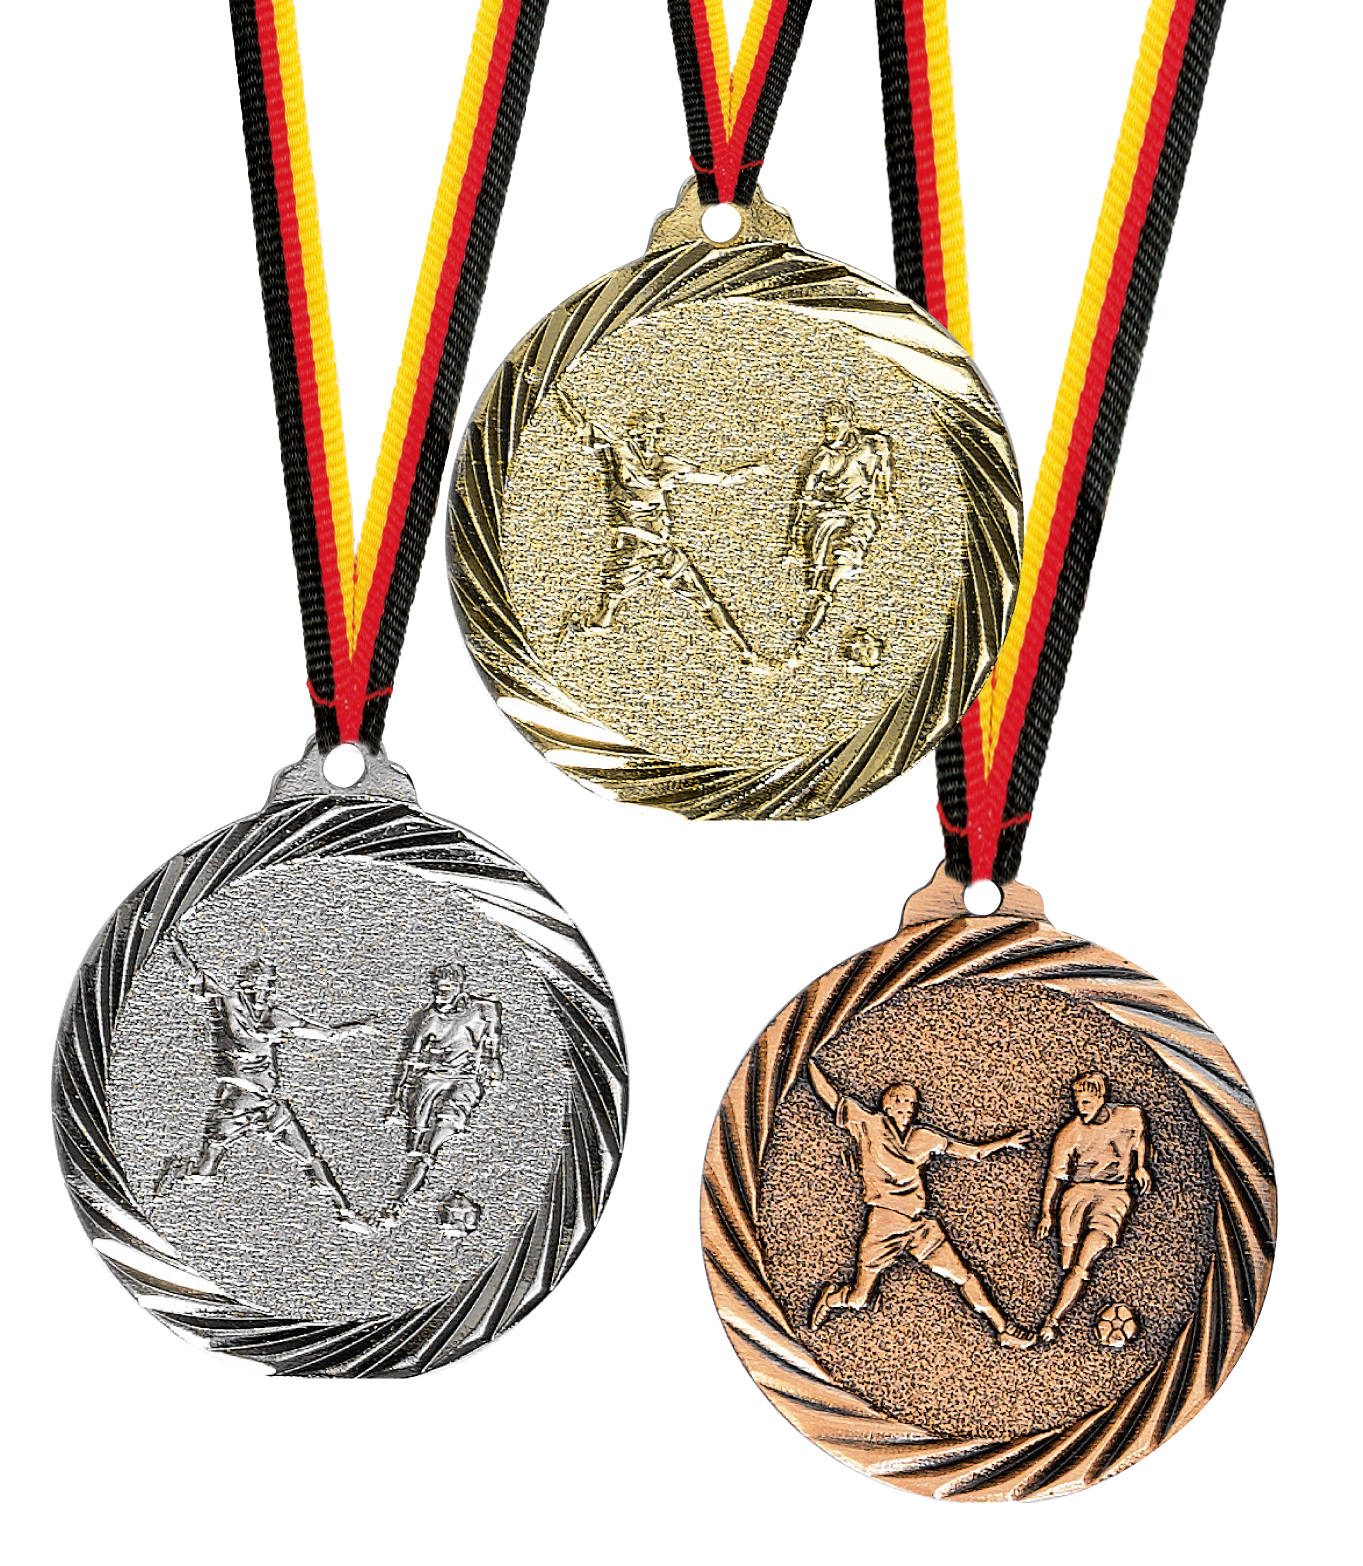 Fußballmedaille Metall geprägt ab 100Stück 32mmØ Medaillen Premium hochwertig edel